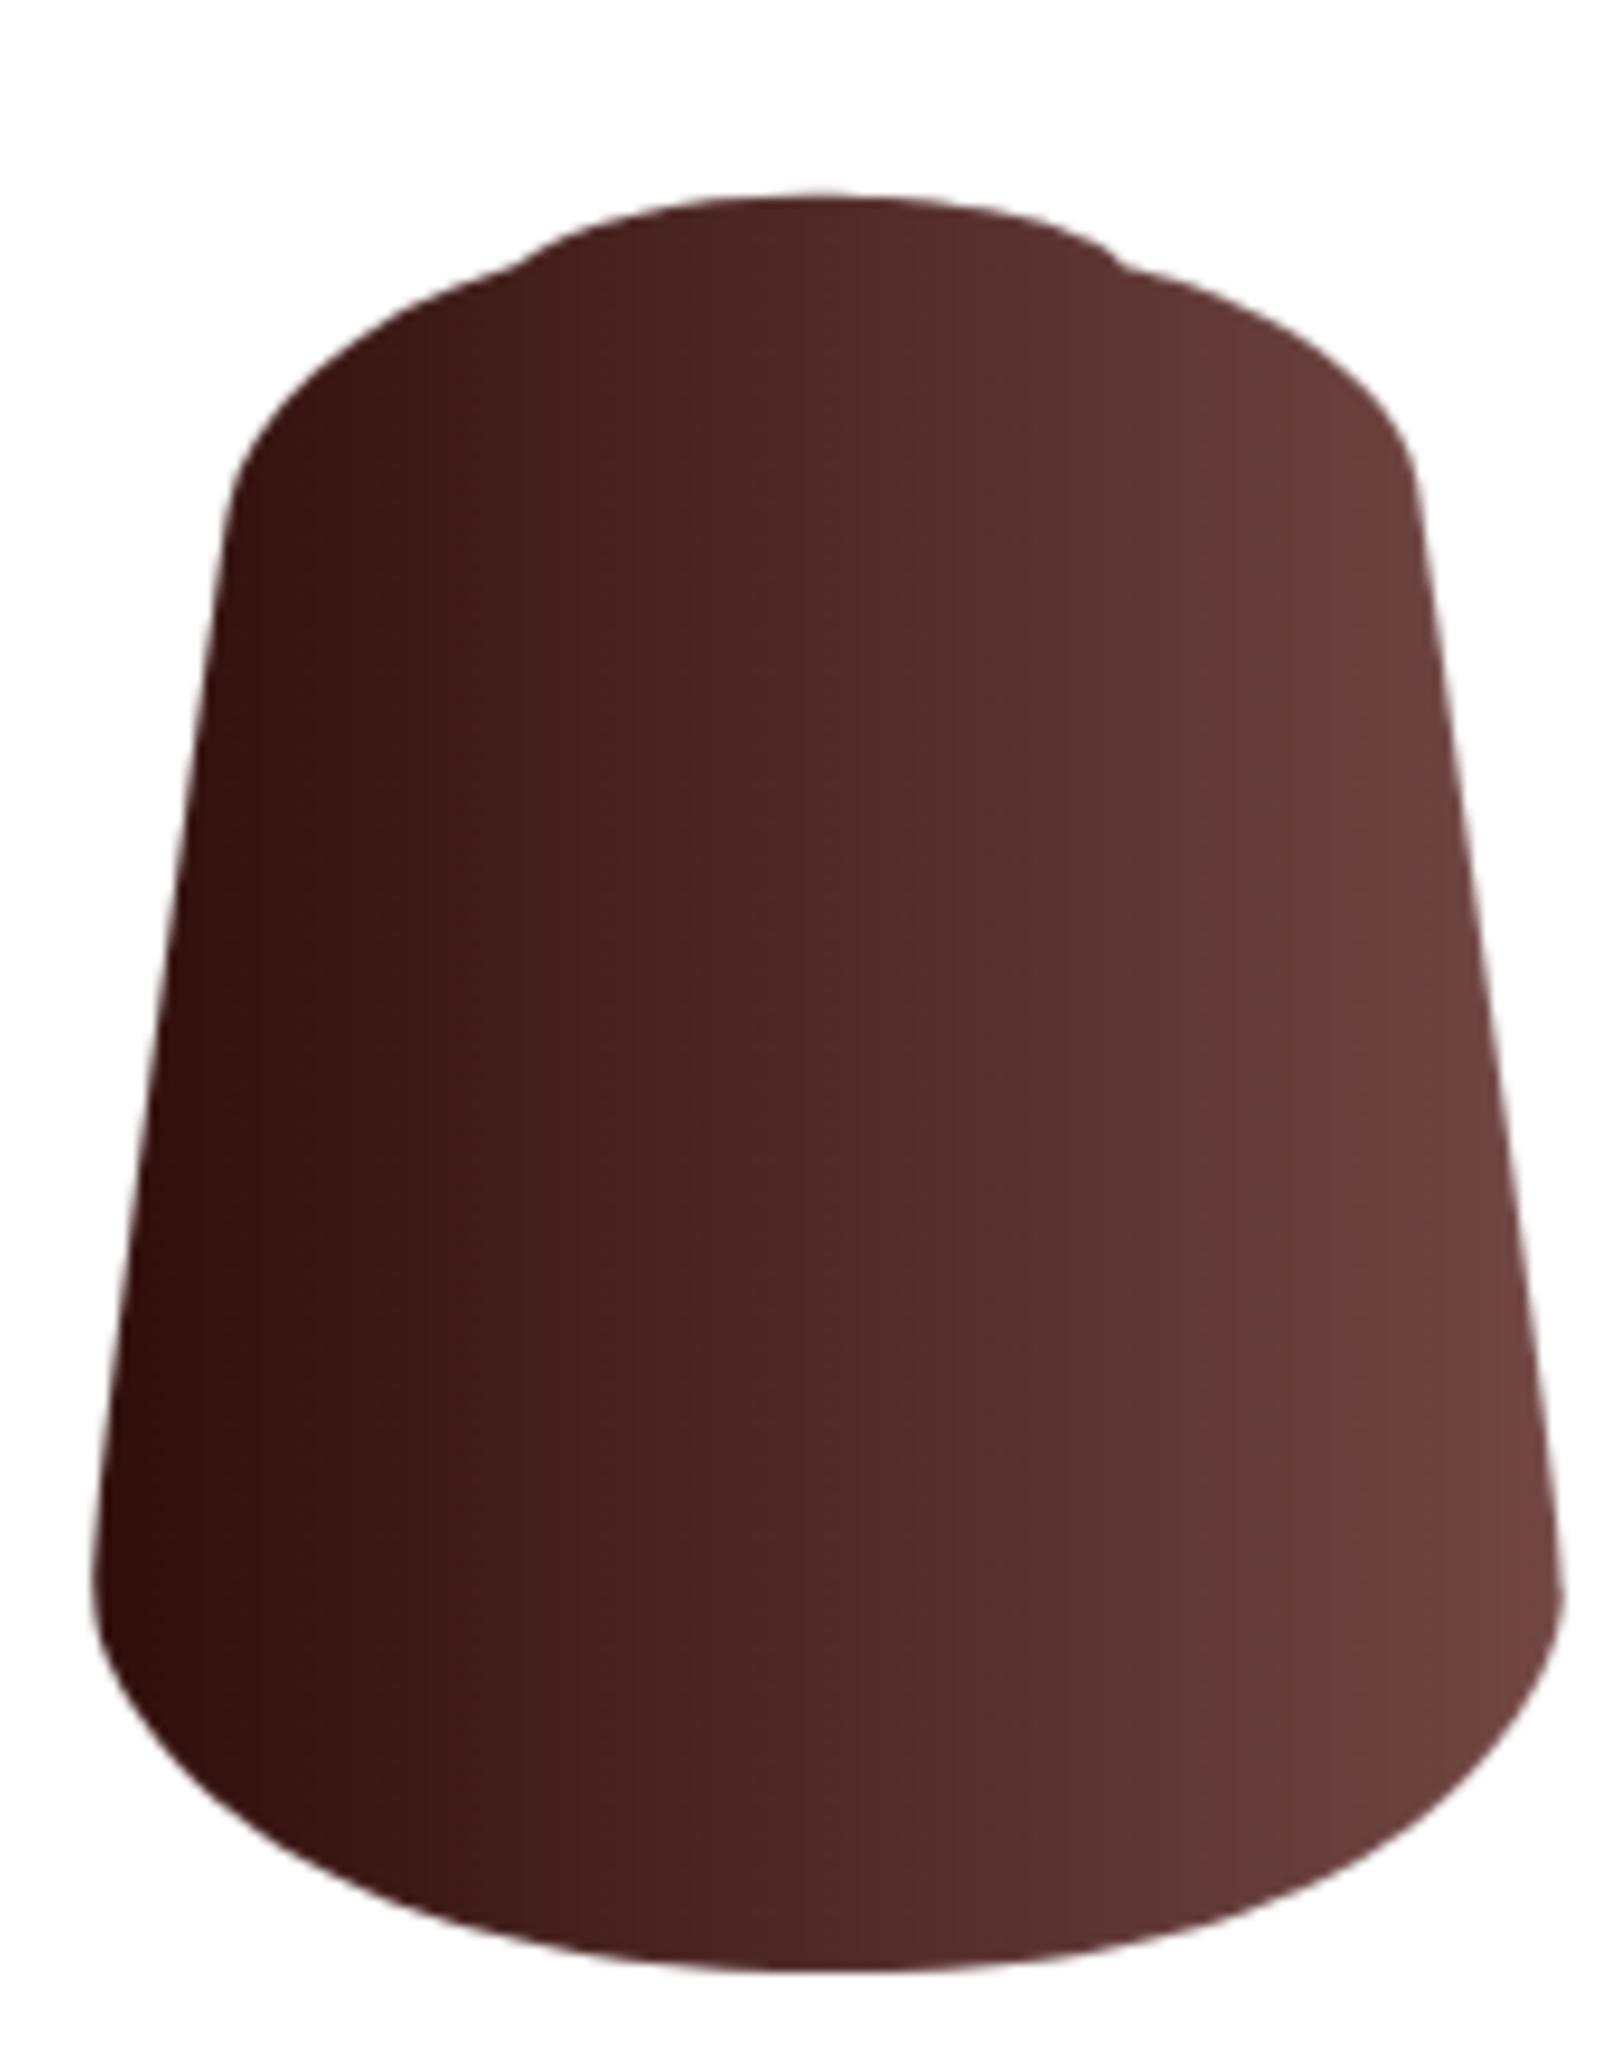 Games Workshop Contrast:  Cygor Brown (18ML) Paint